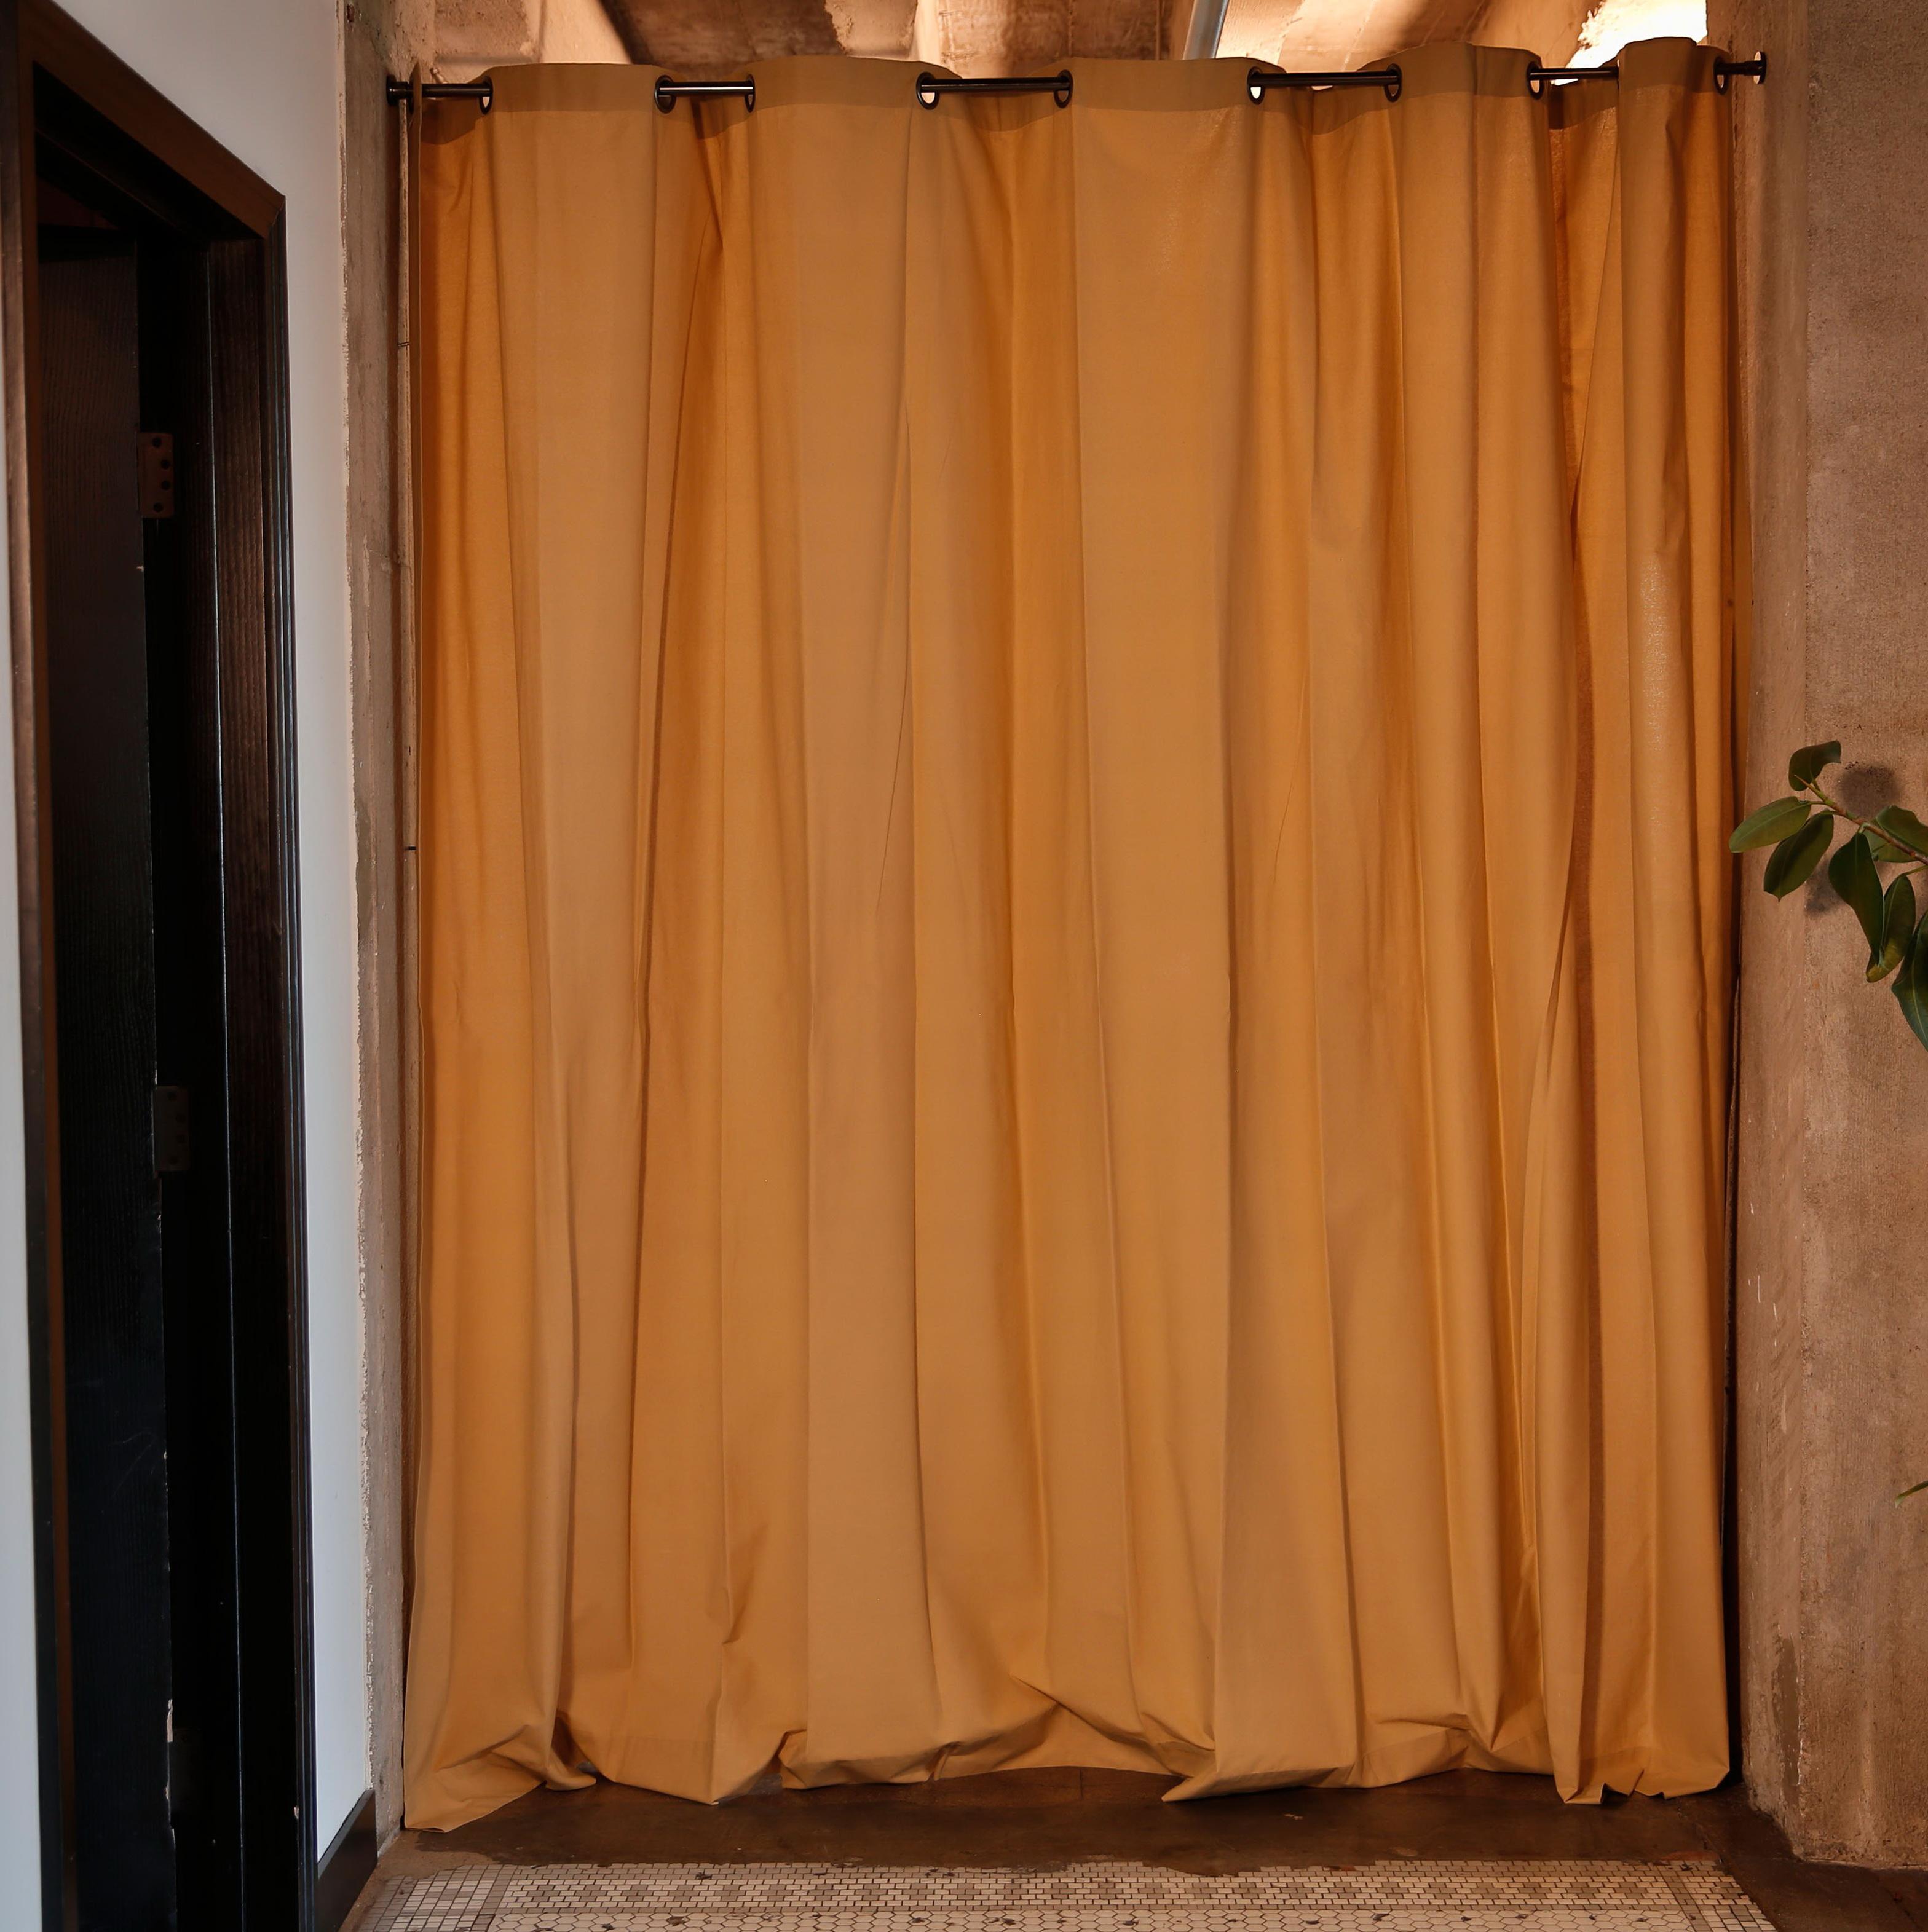 Dorm Room Curtain Dividers